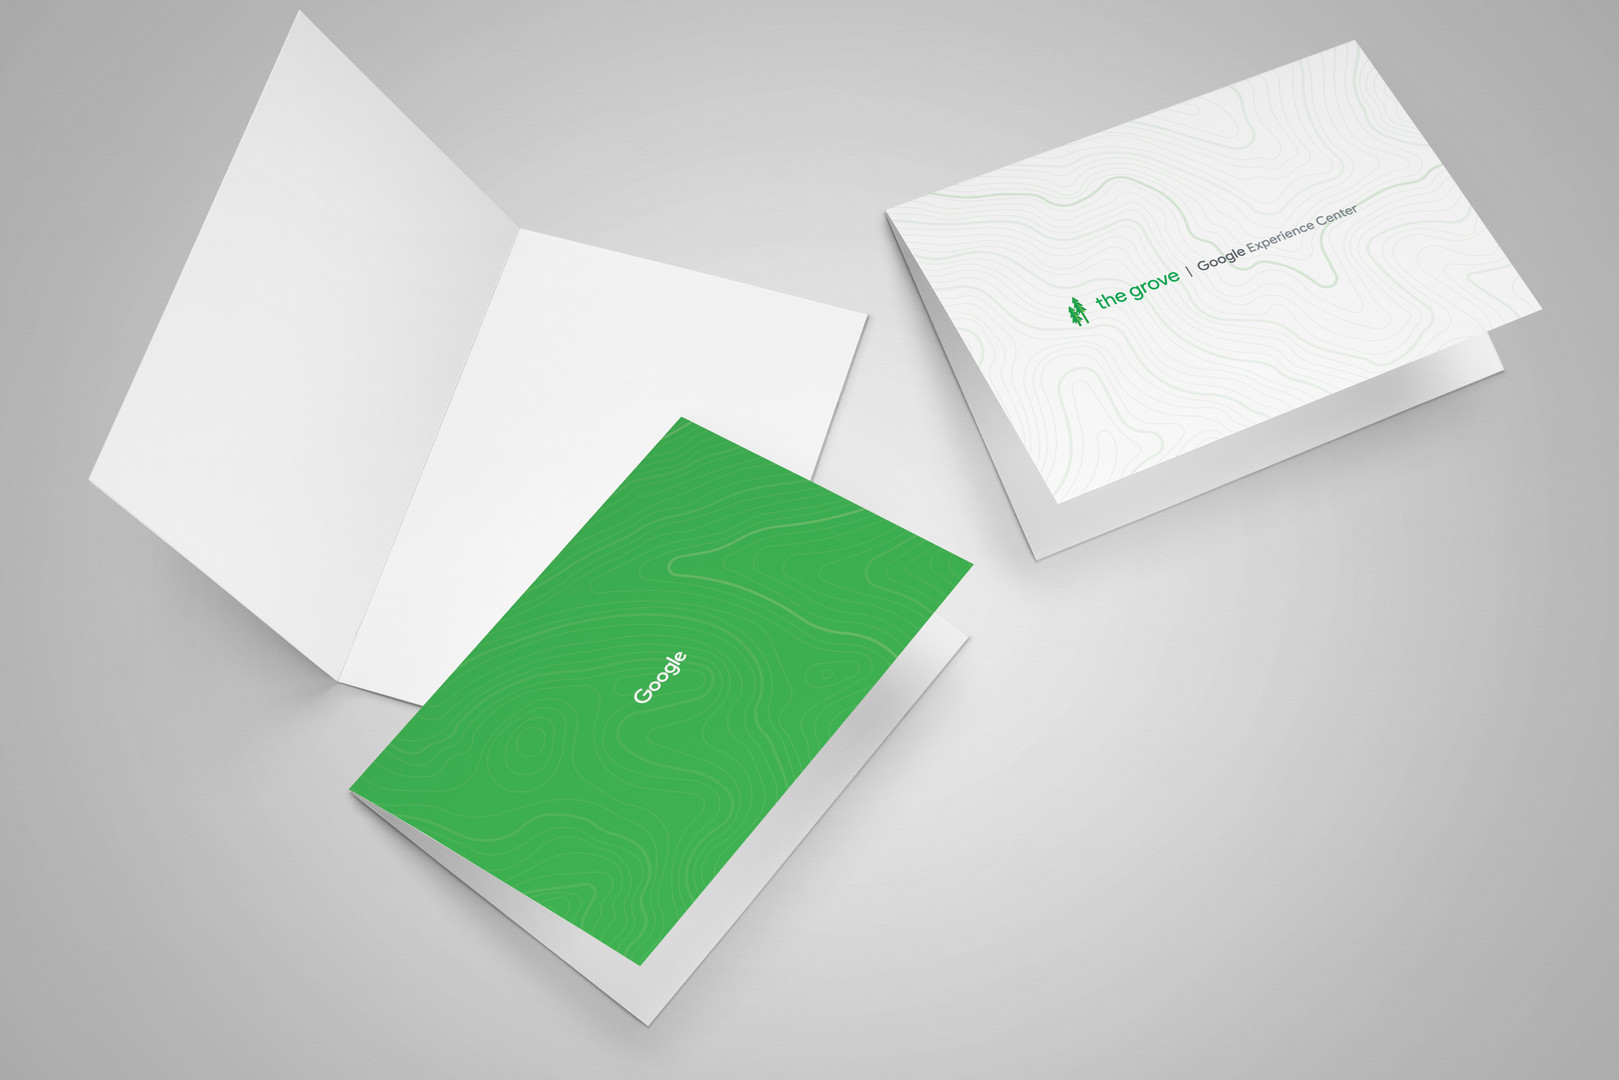 Invitation - Greeting Card Mockup - By P